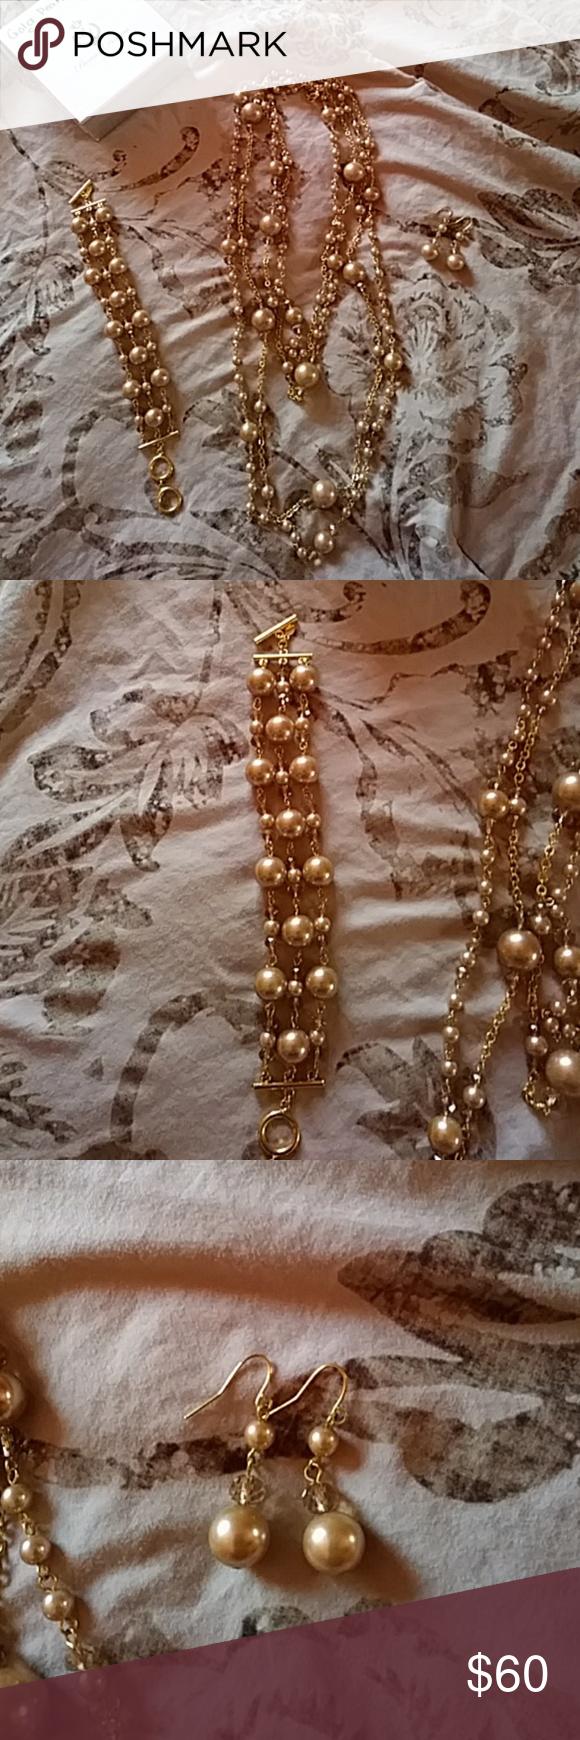 Pretty in pearls necklace bracelet earrings set layered